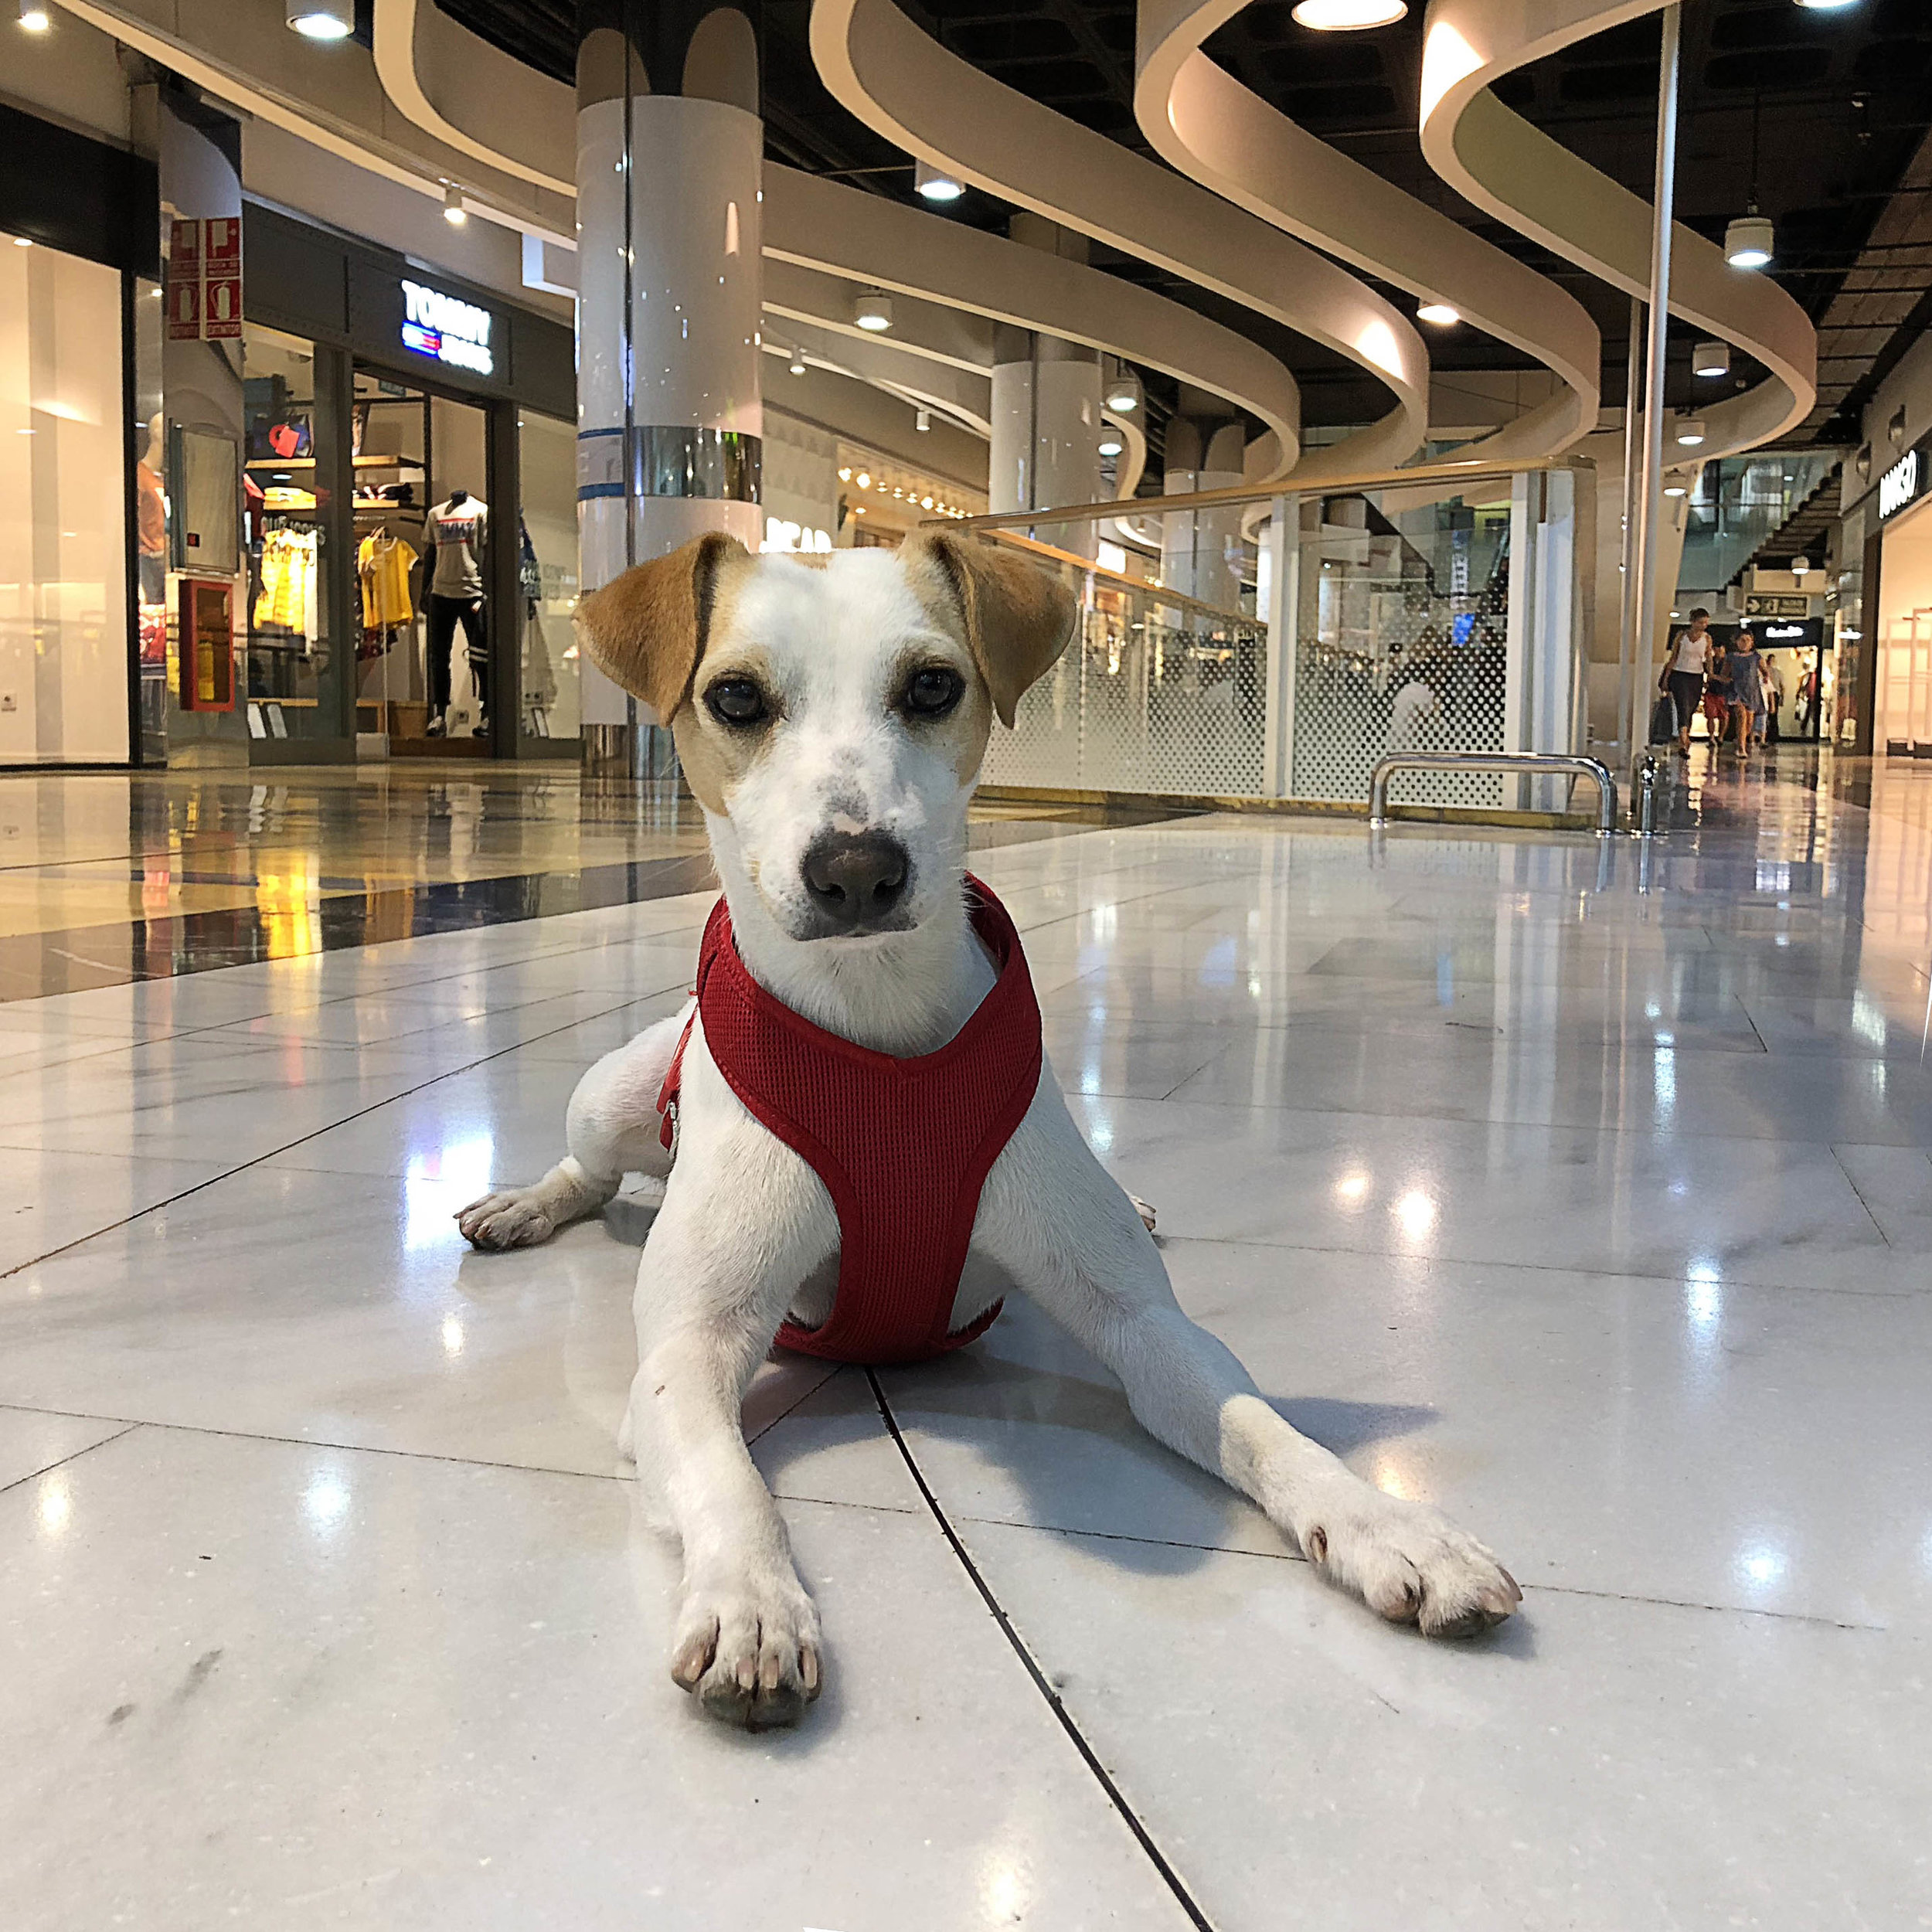 In Porto Pi shopping center.